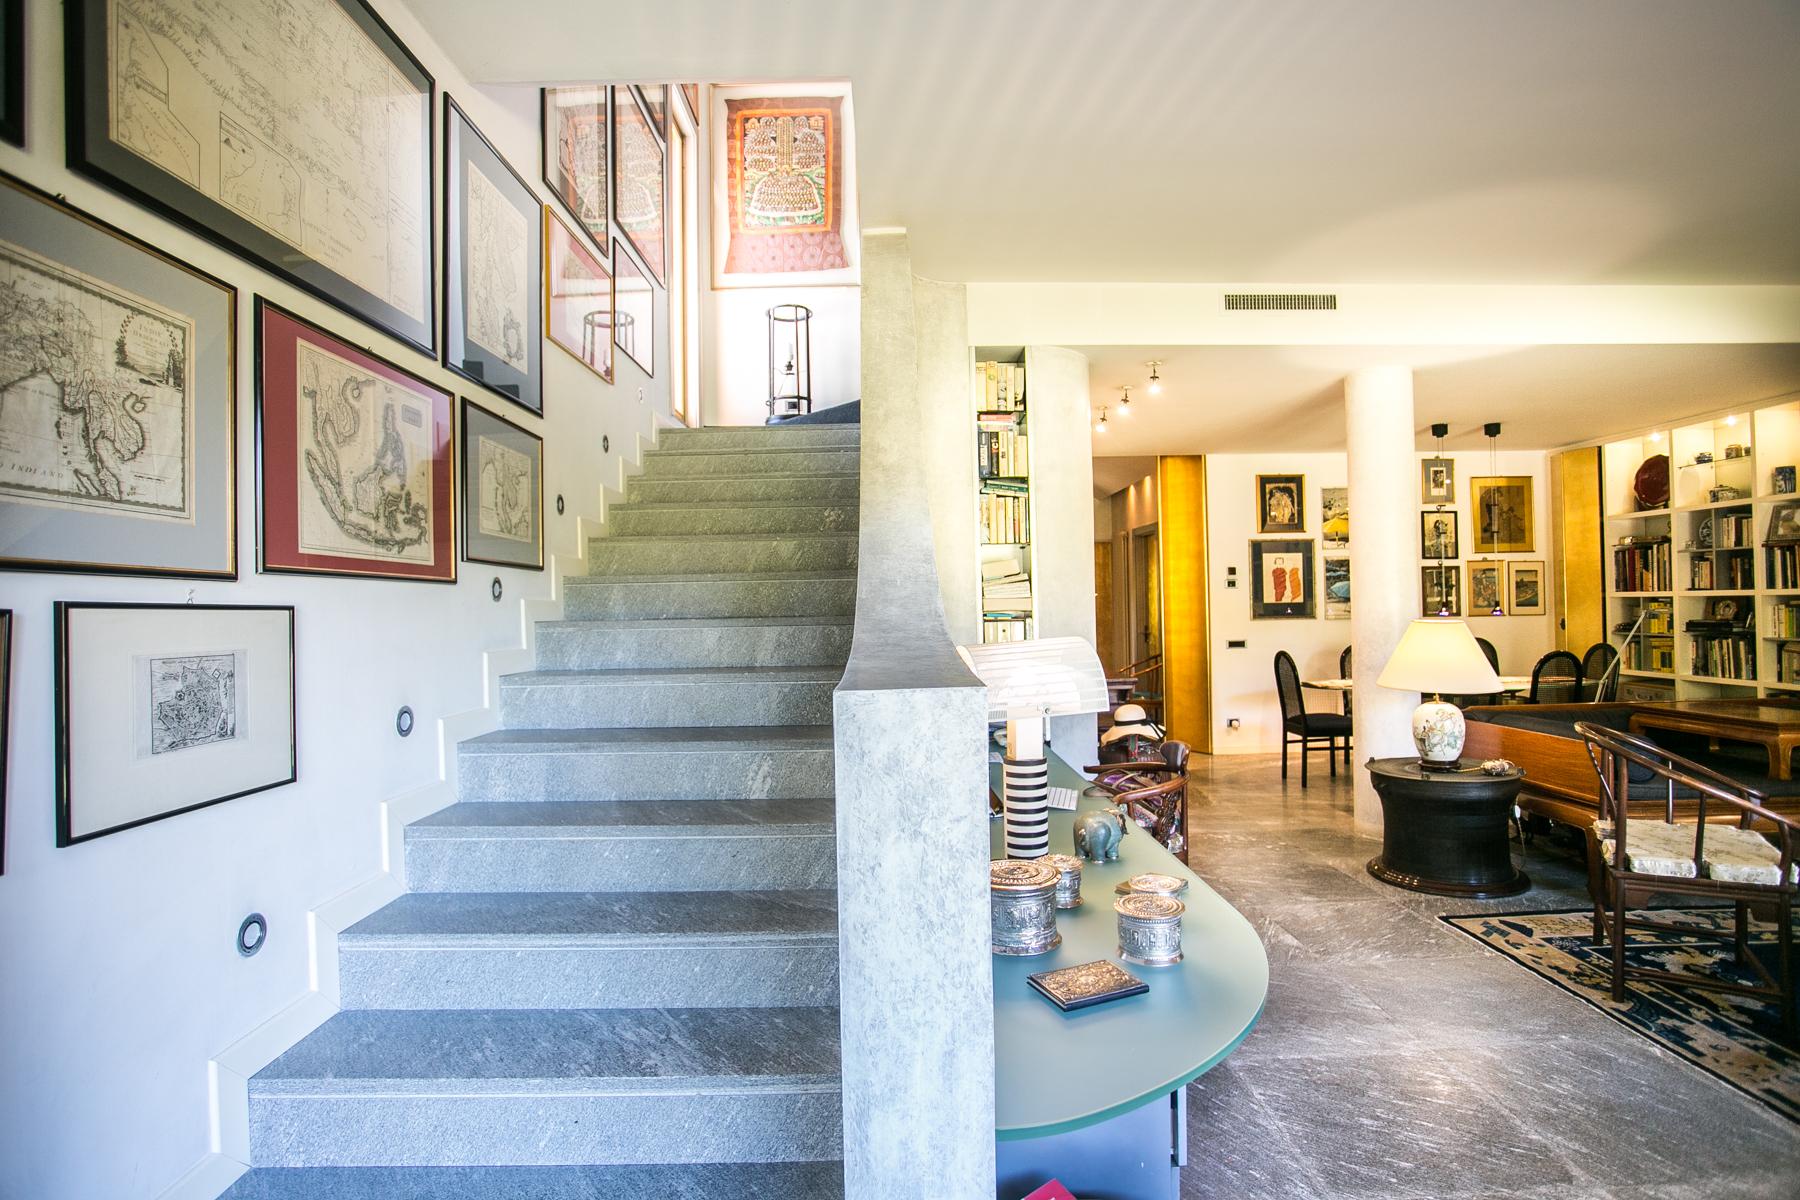 Additional photo for property listing at Multi level apartament inside Monticello golf club Via Volta Monticello, Como 22070 Italy